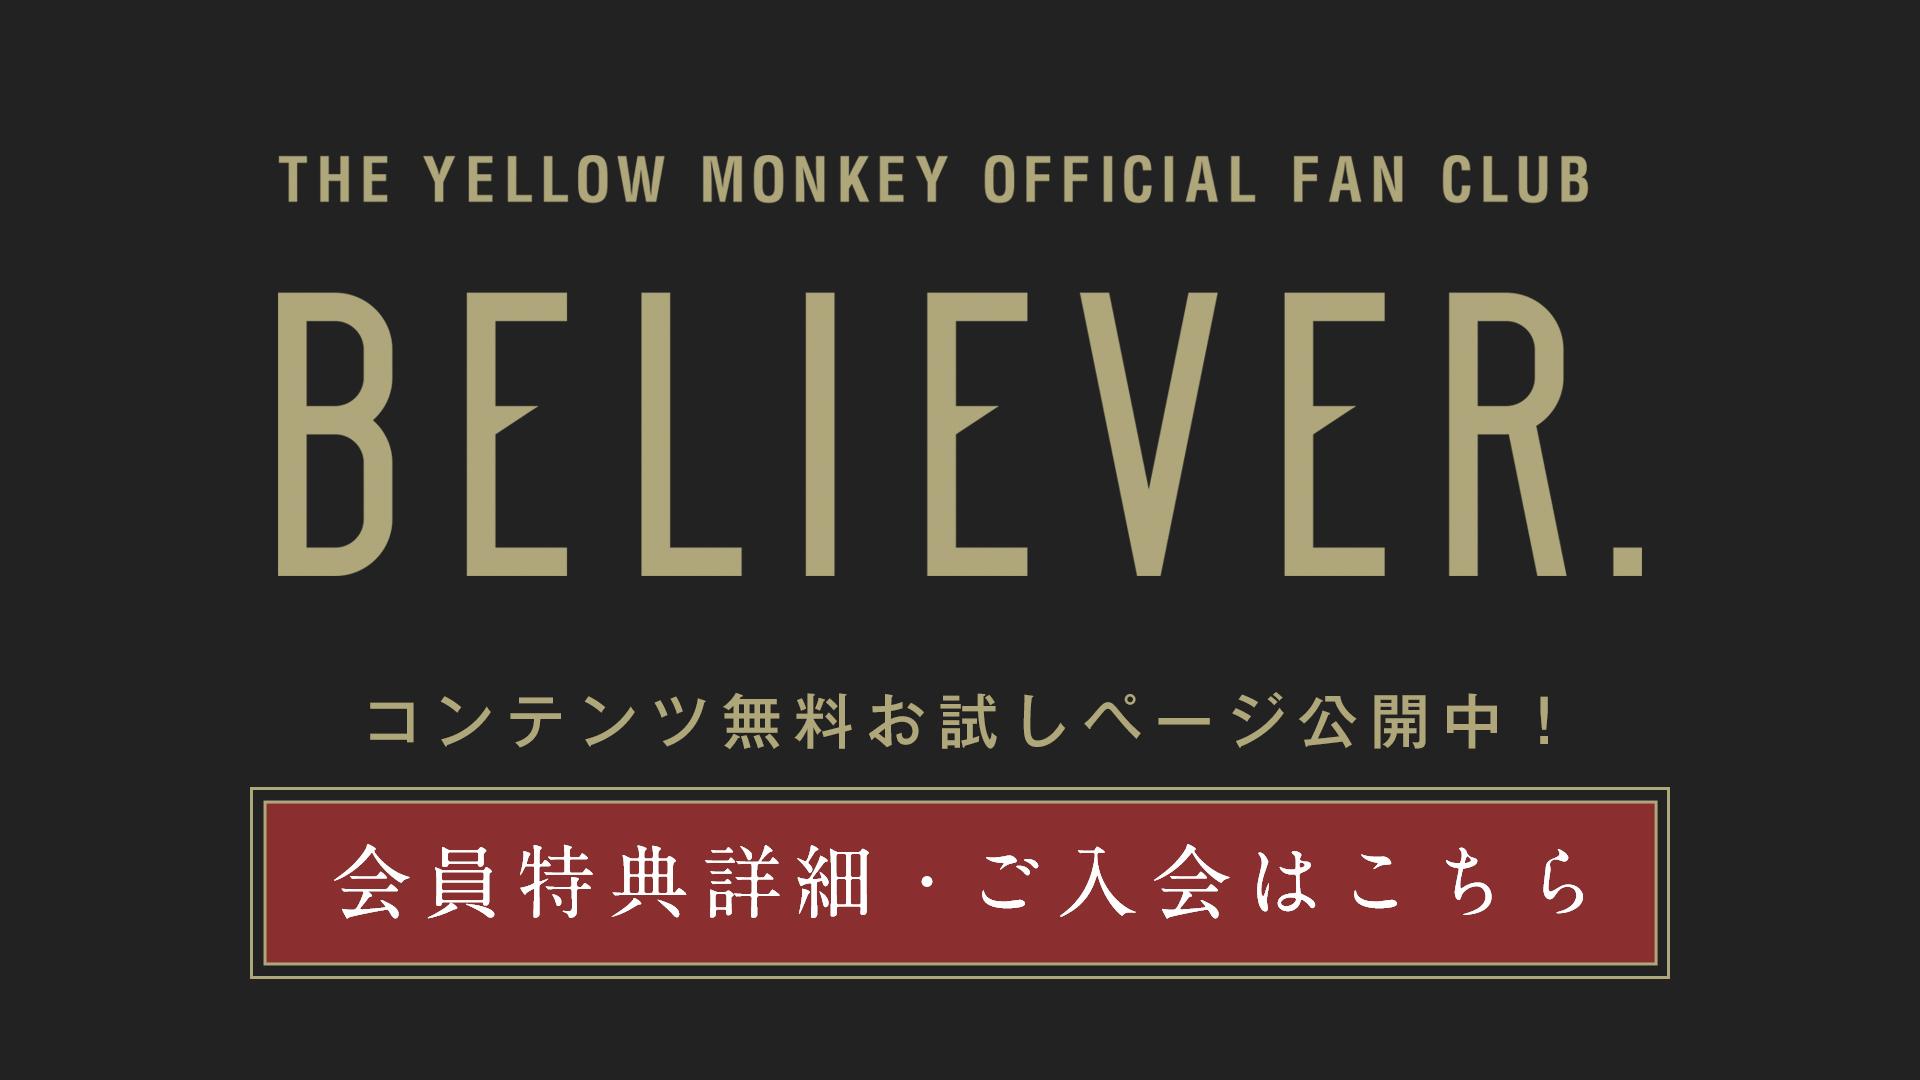 「BELIEVER.」新規入会受付中!